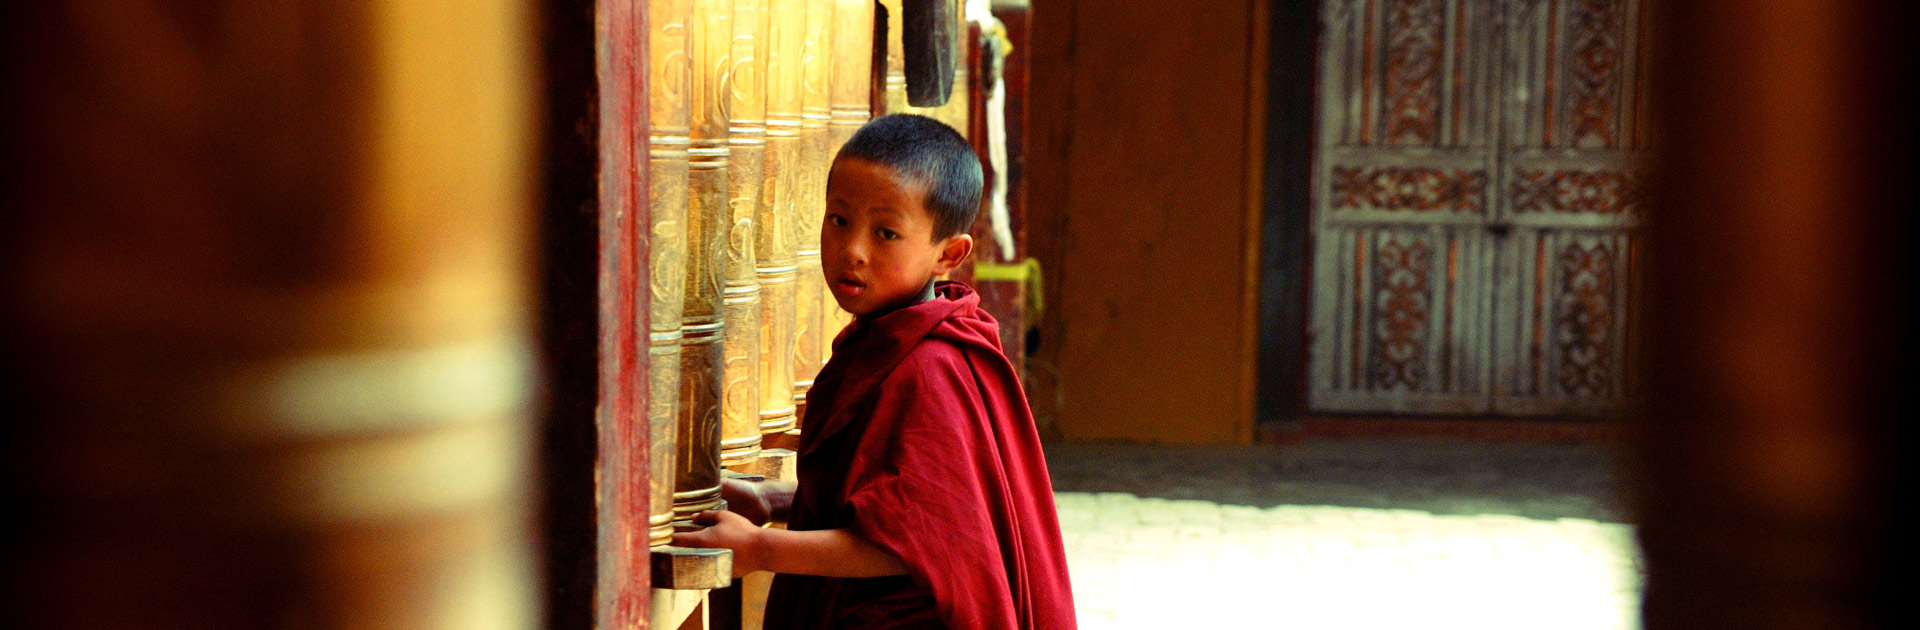 CN Paisaje de China y Lhasa 13 días 1